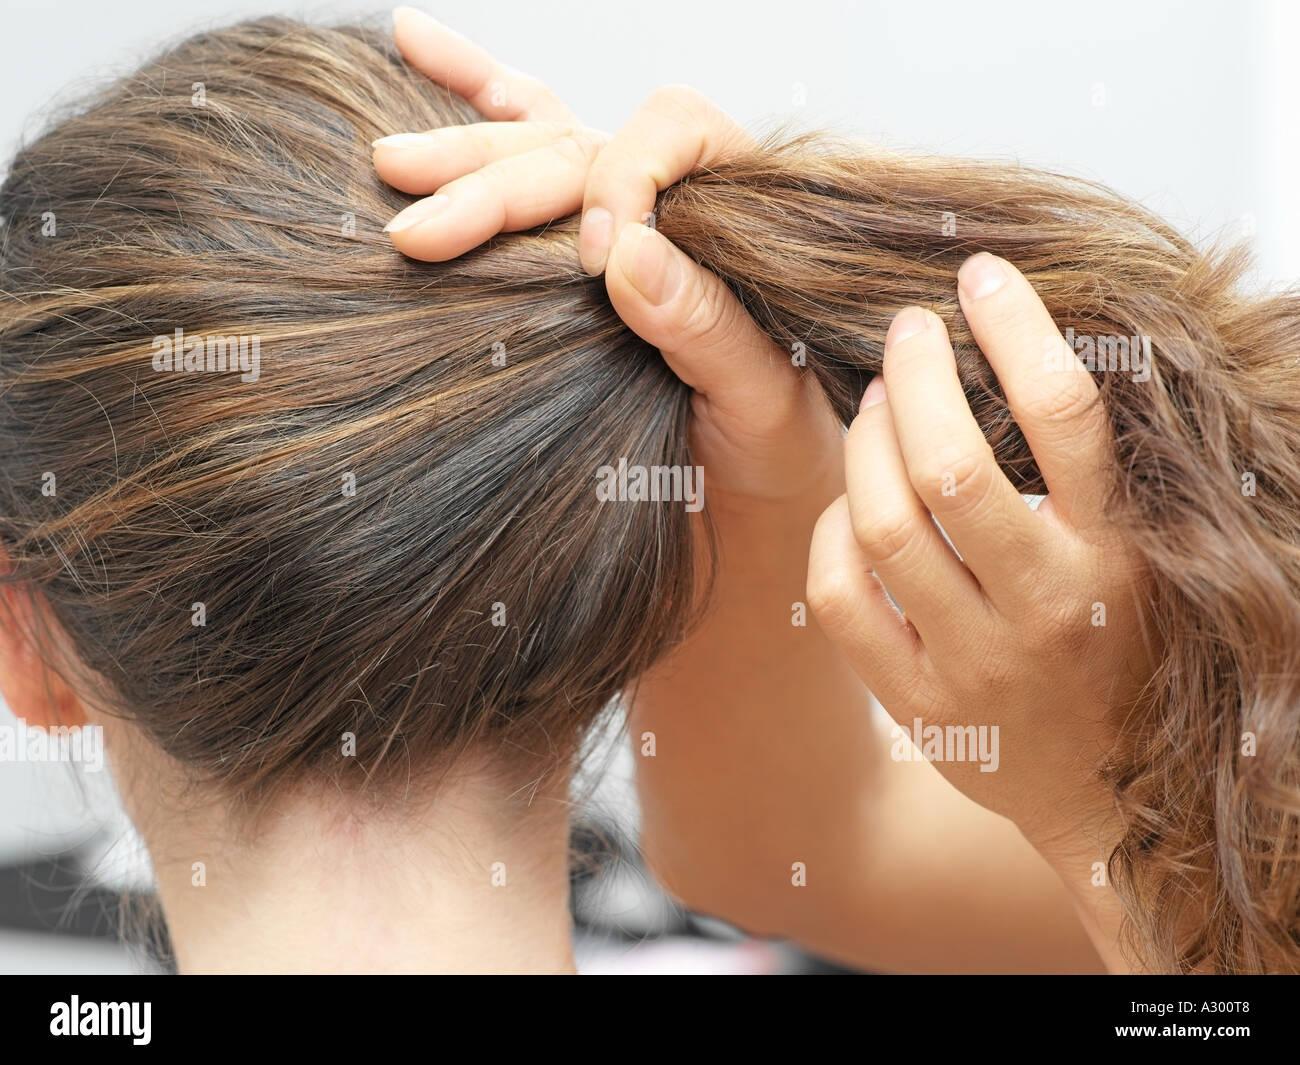 Woman having hair done - Stock Image